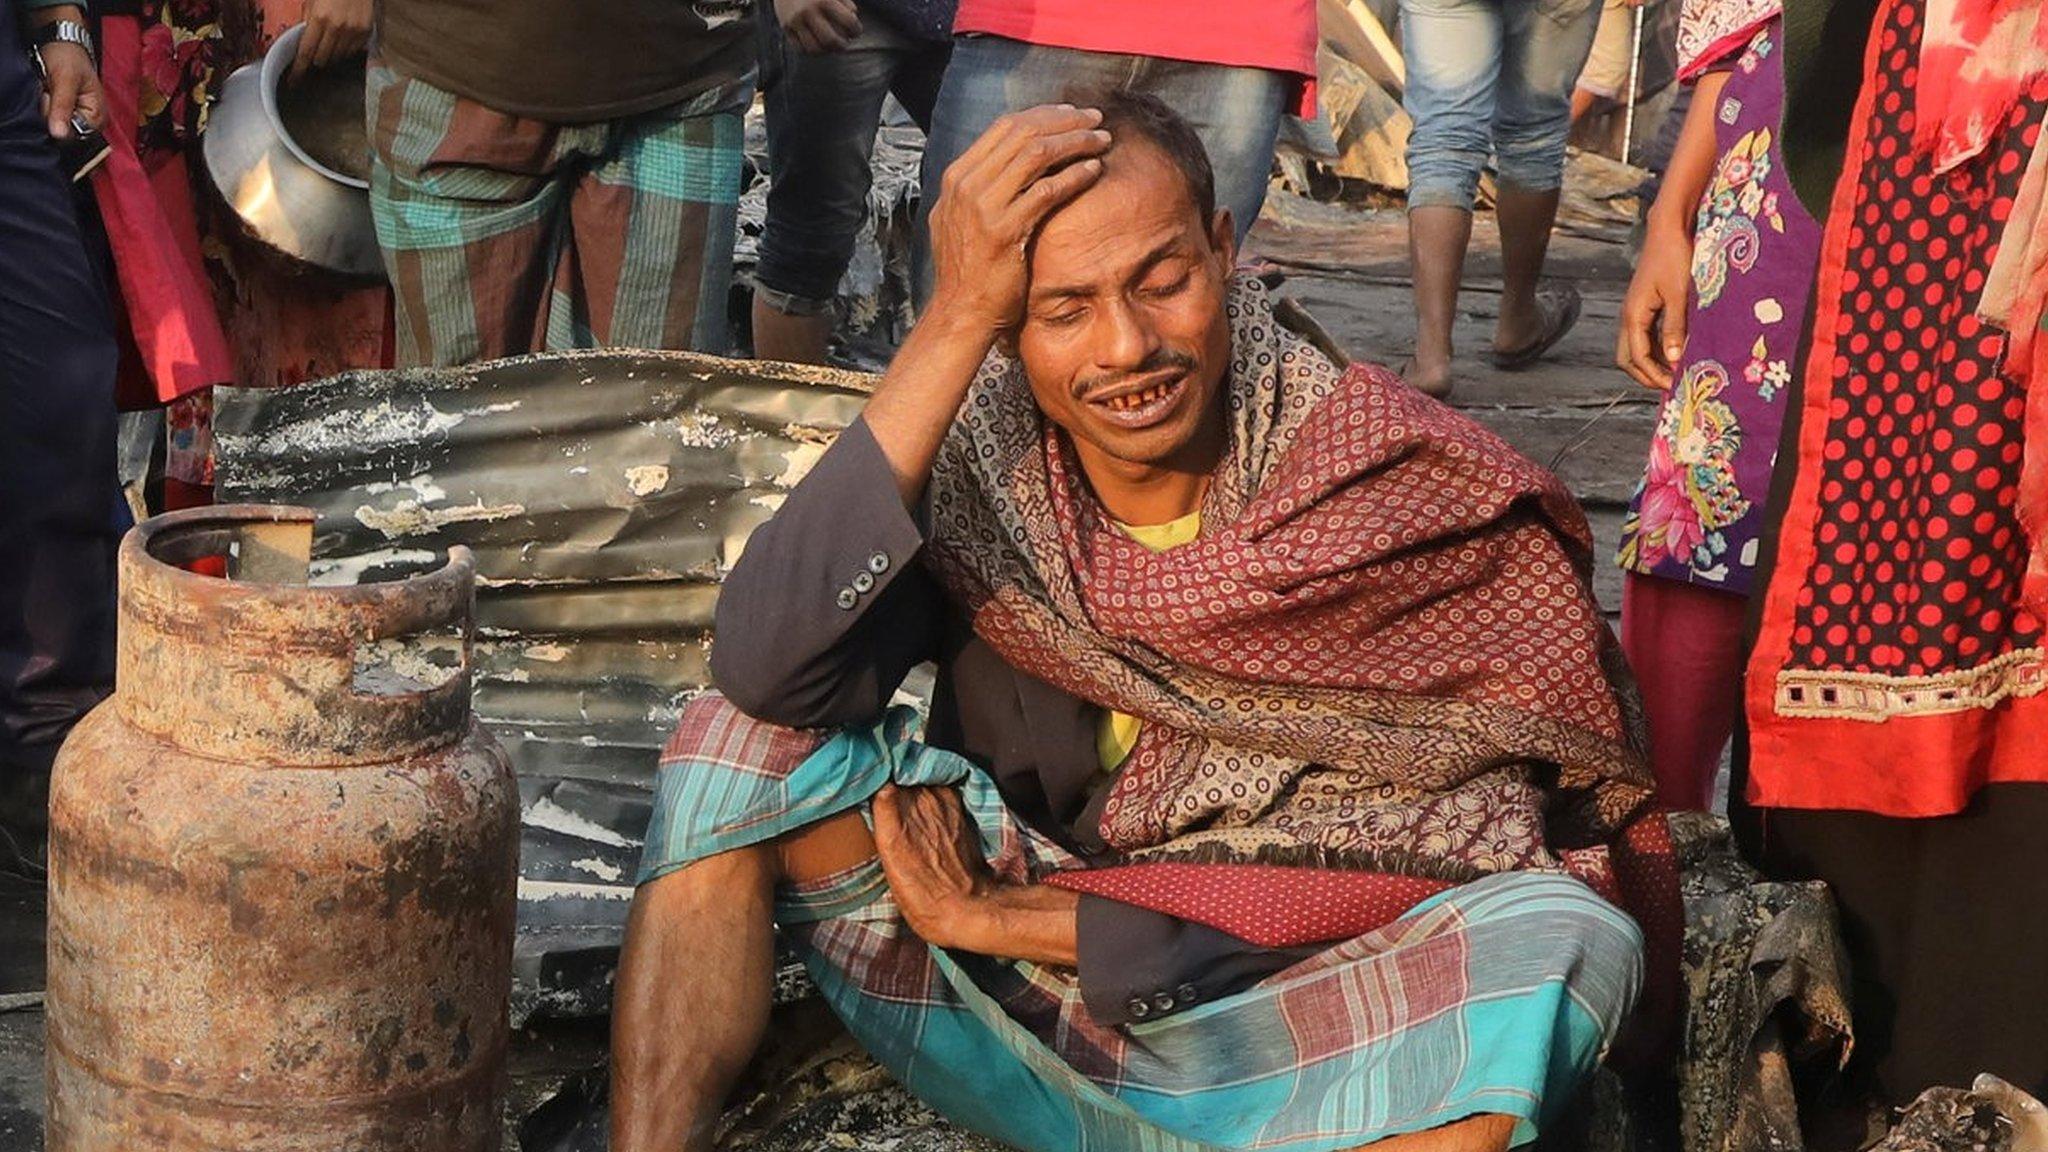 Bangladesh slum fire: Nine dead in Chittagong blaze